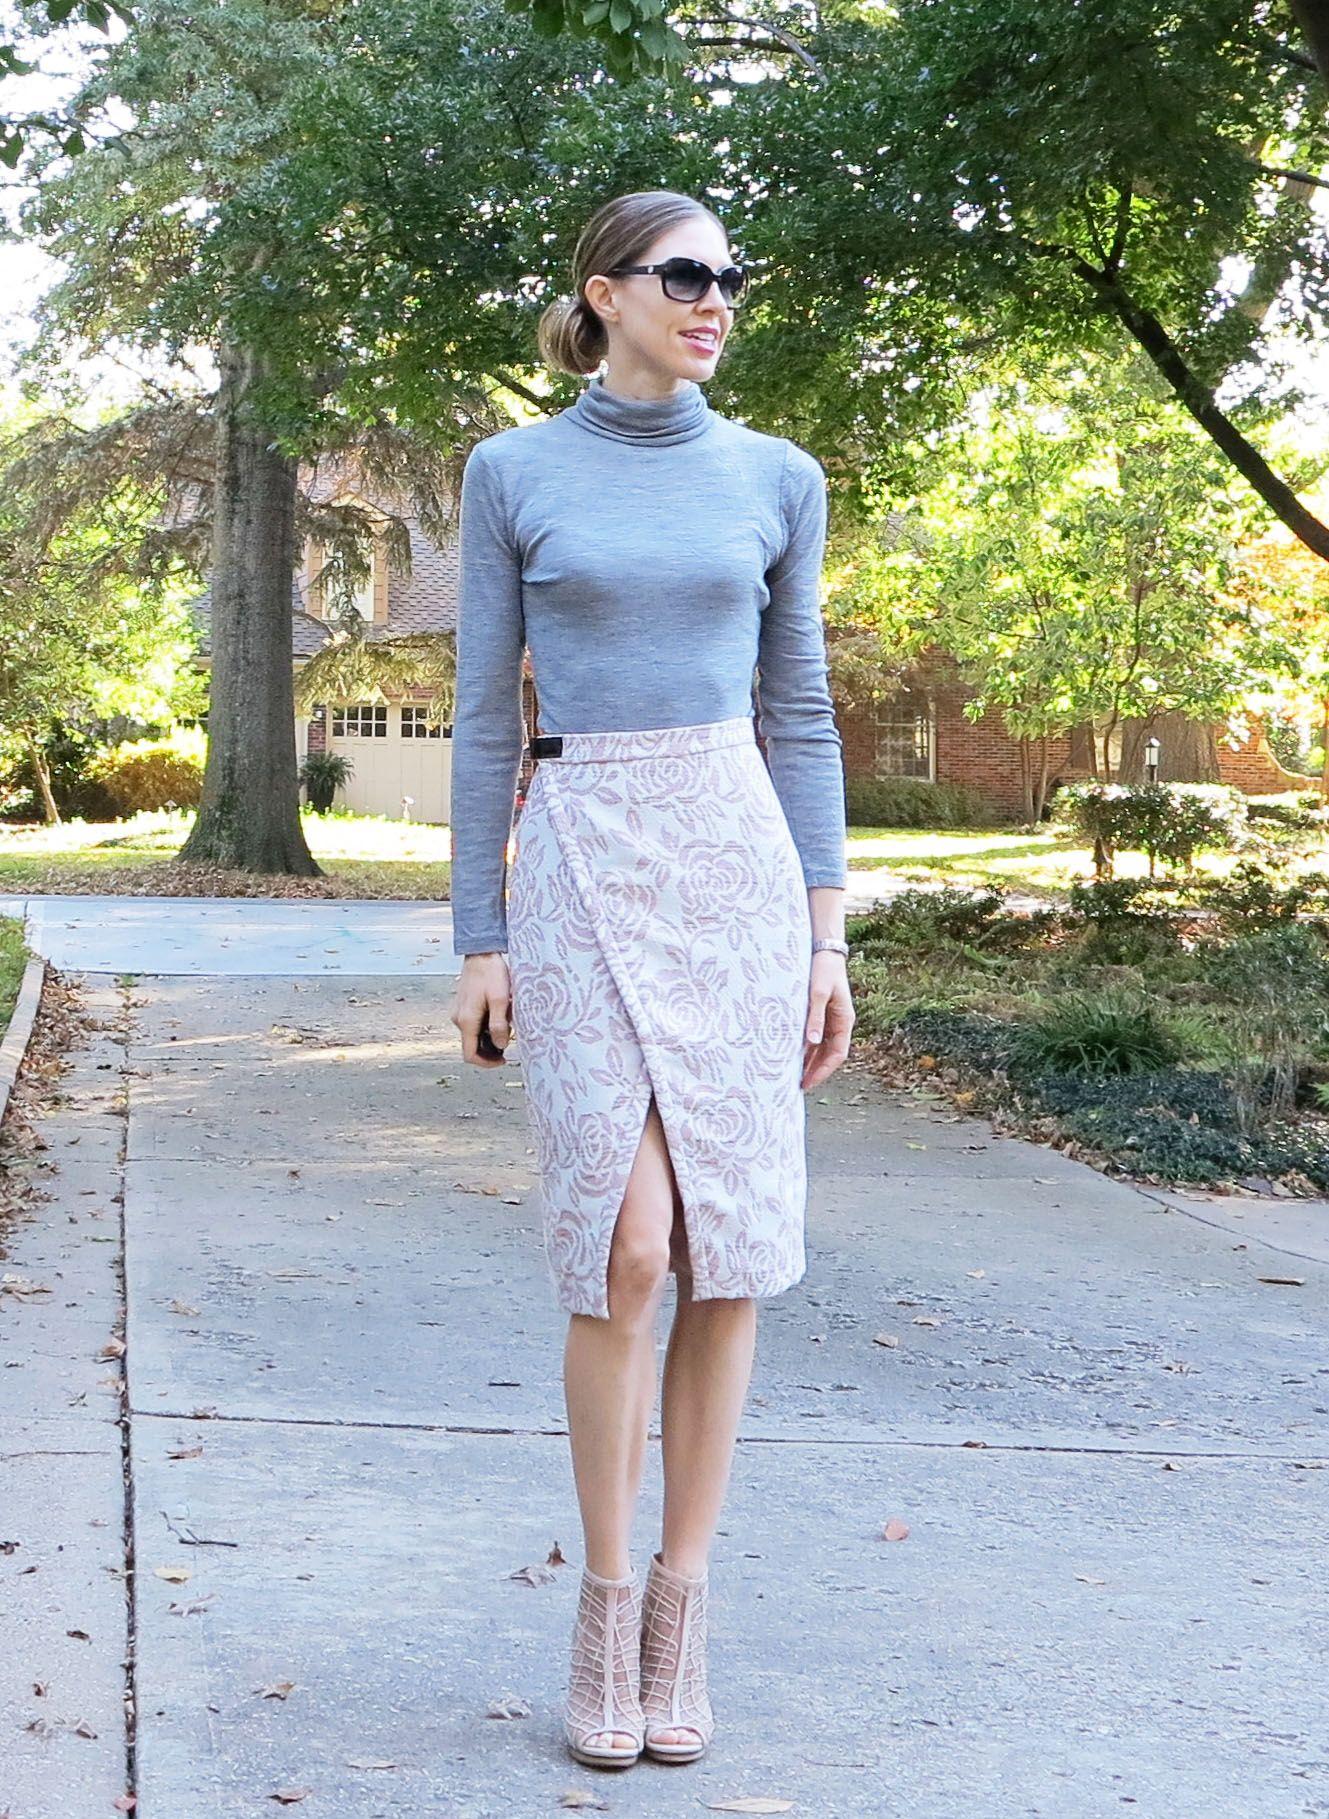 6b869d65903 Wrap skirt drafting using a pencil skirt block More